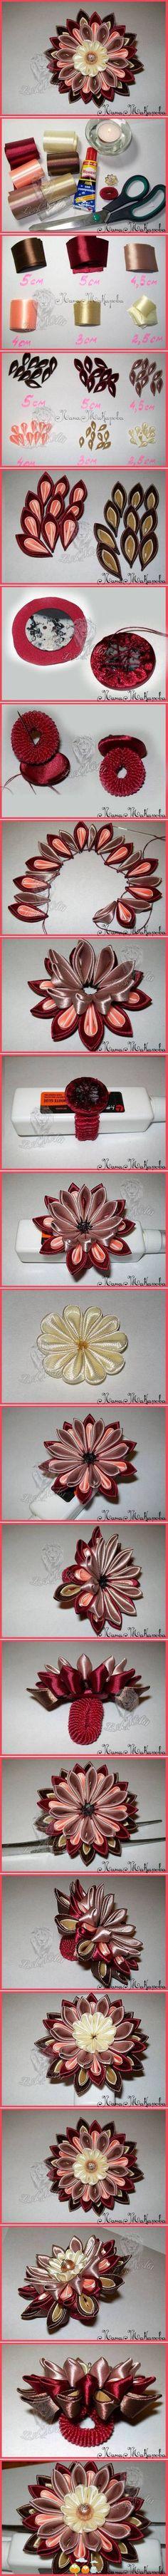 Ribbon flower tutorial multi-colored